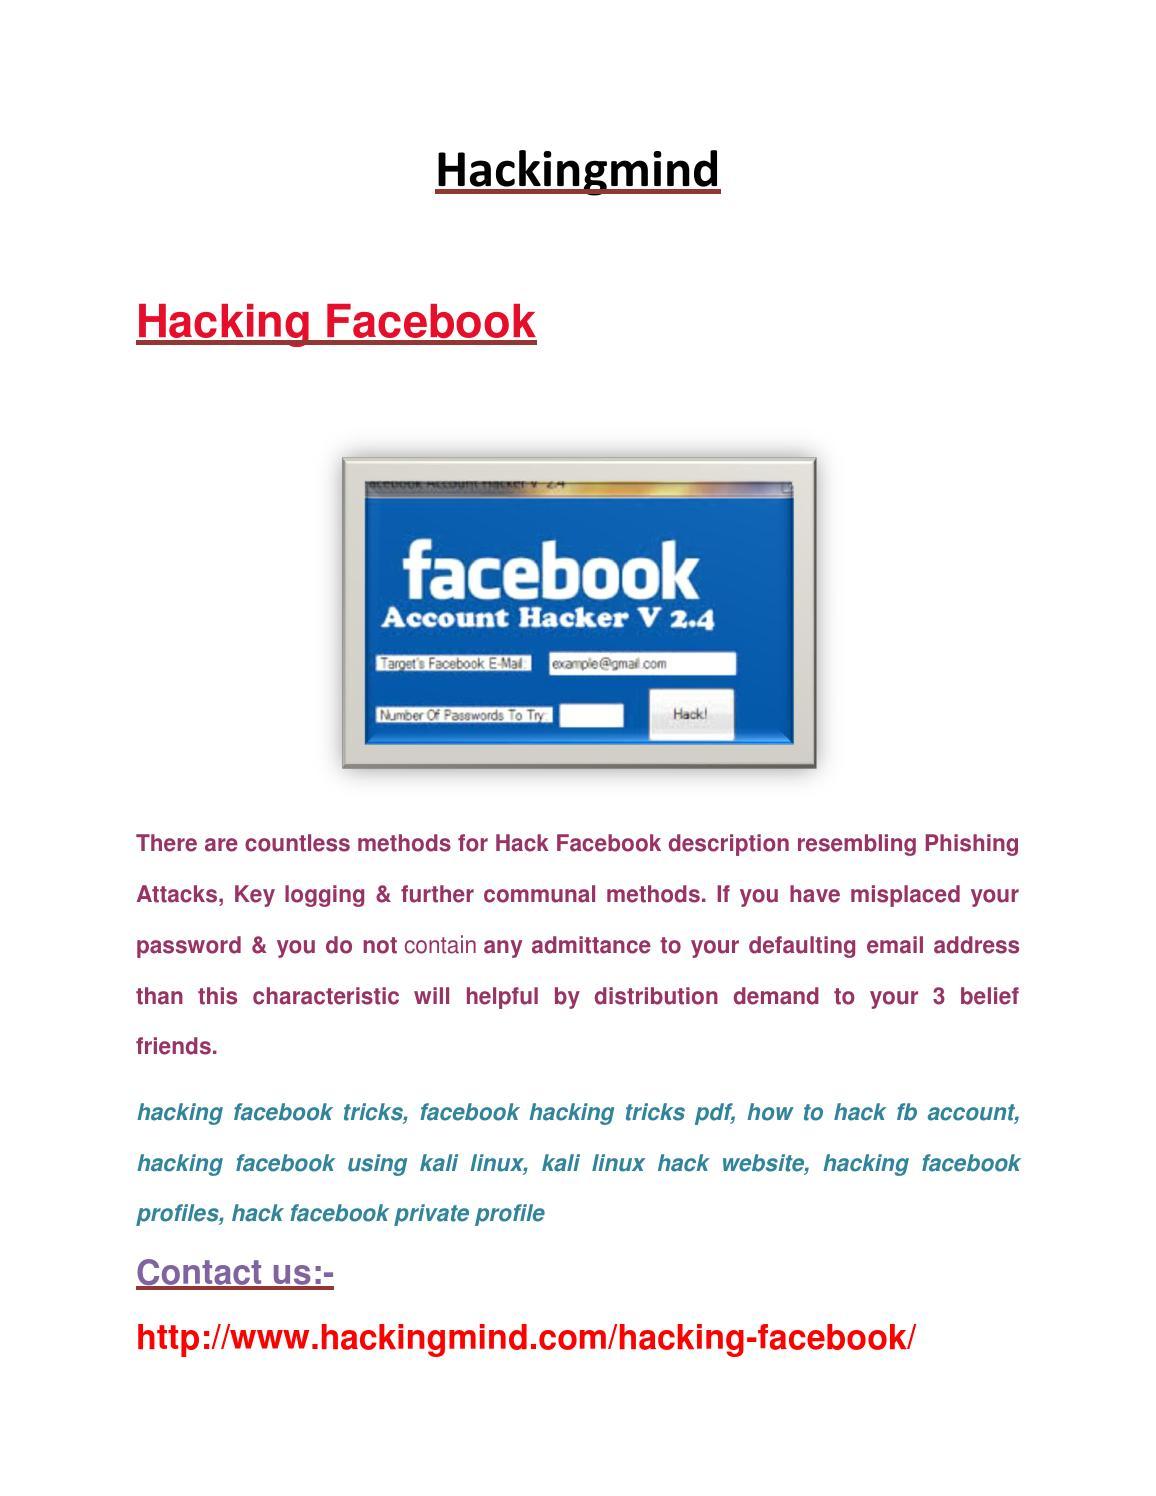 Hacking Facebook By Swati Sharma Issuu